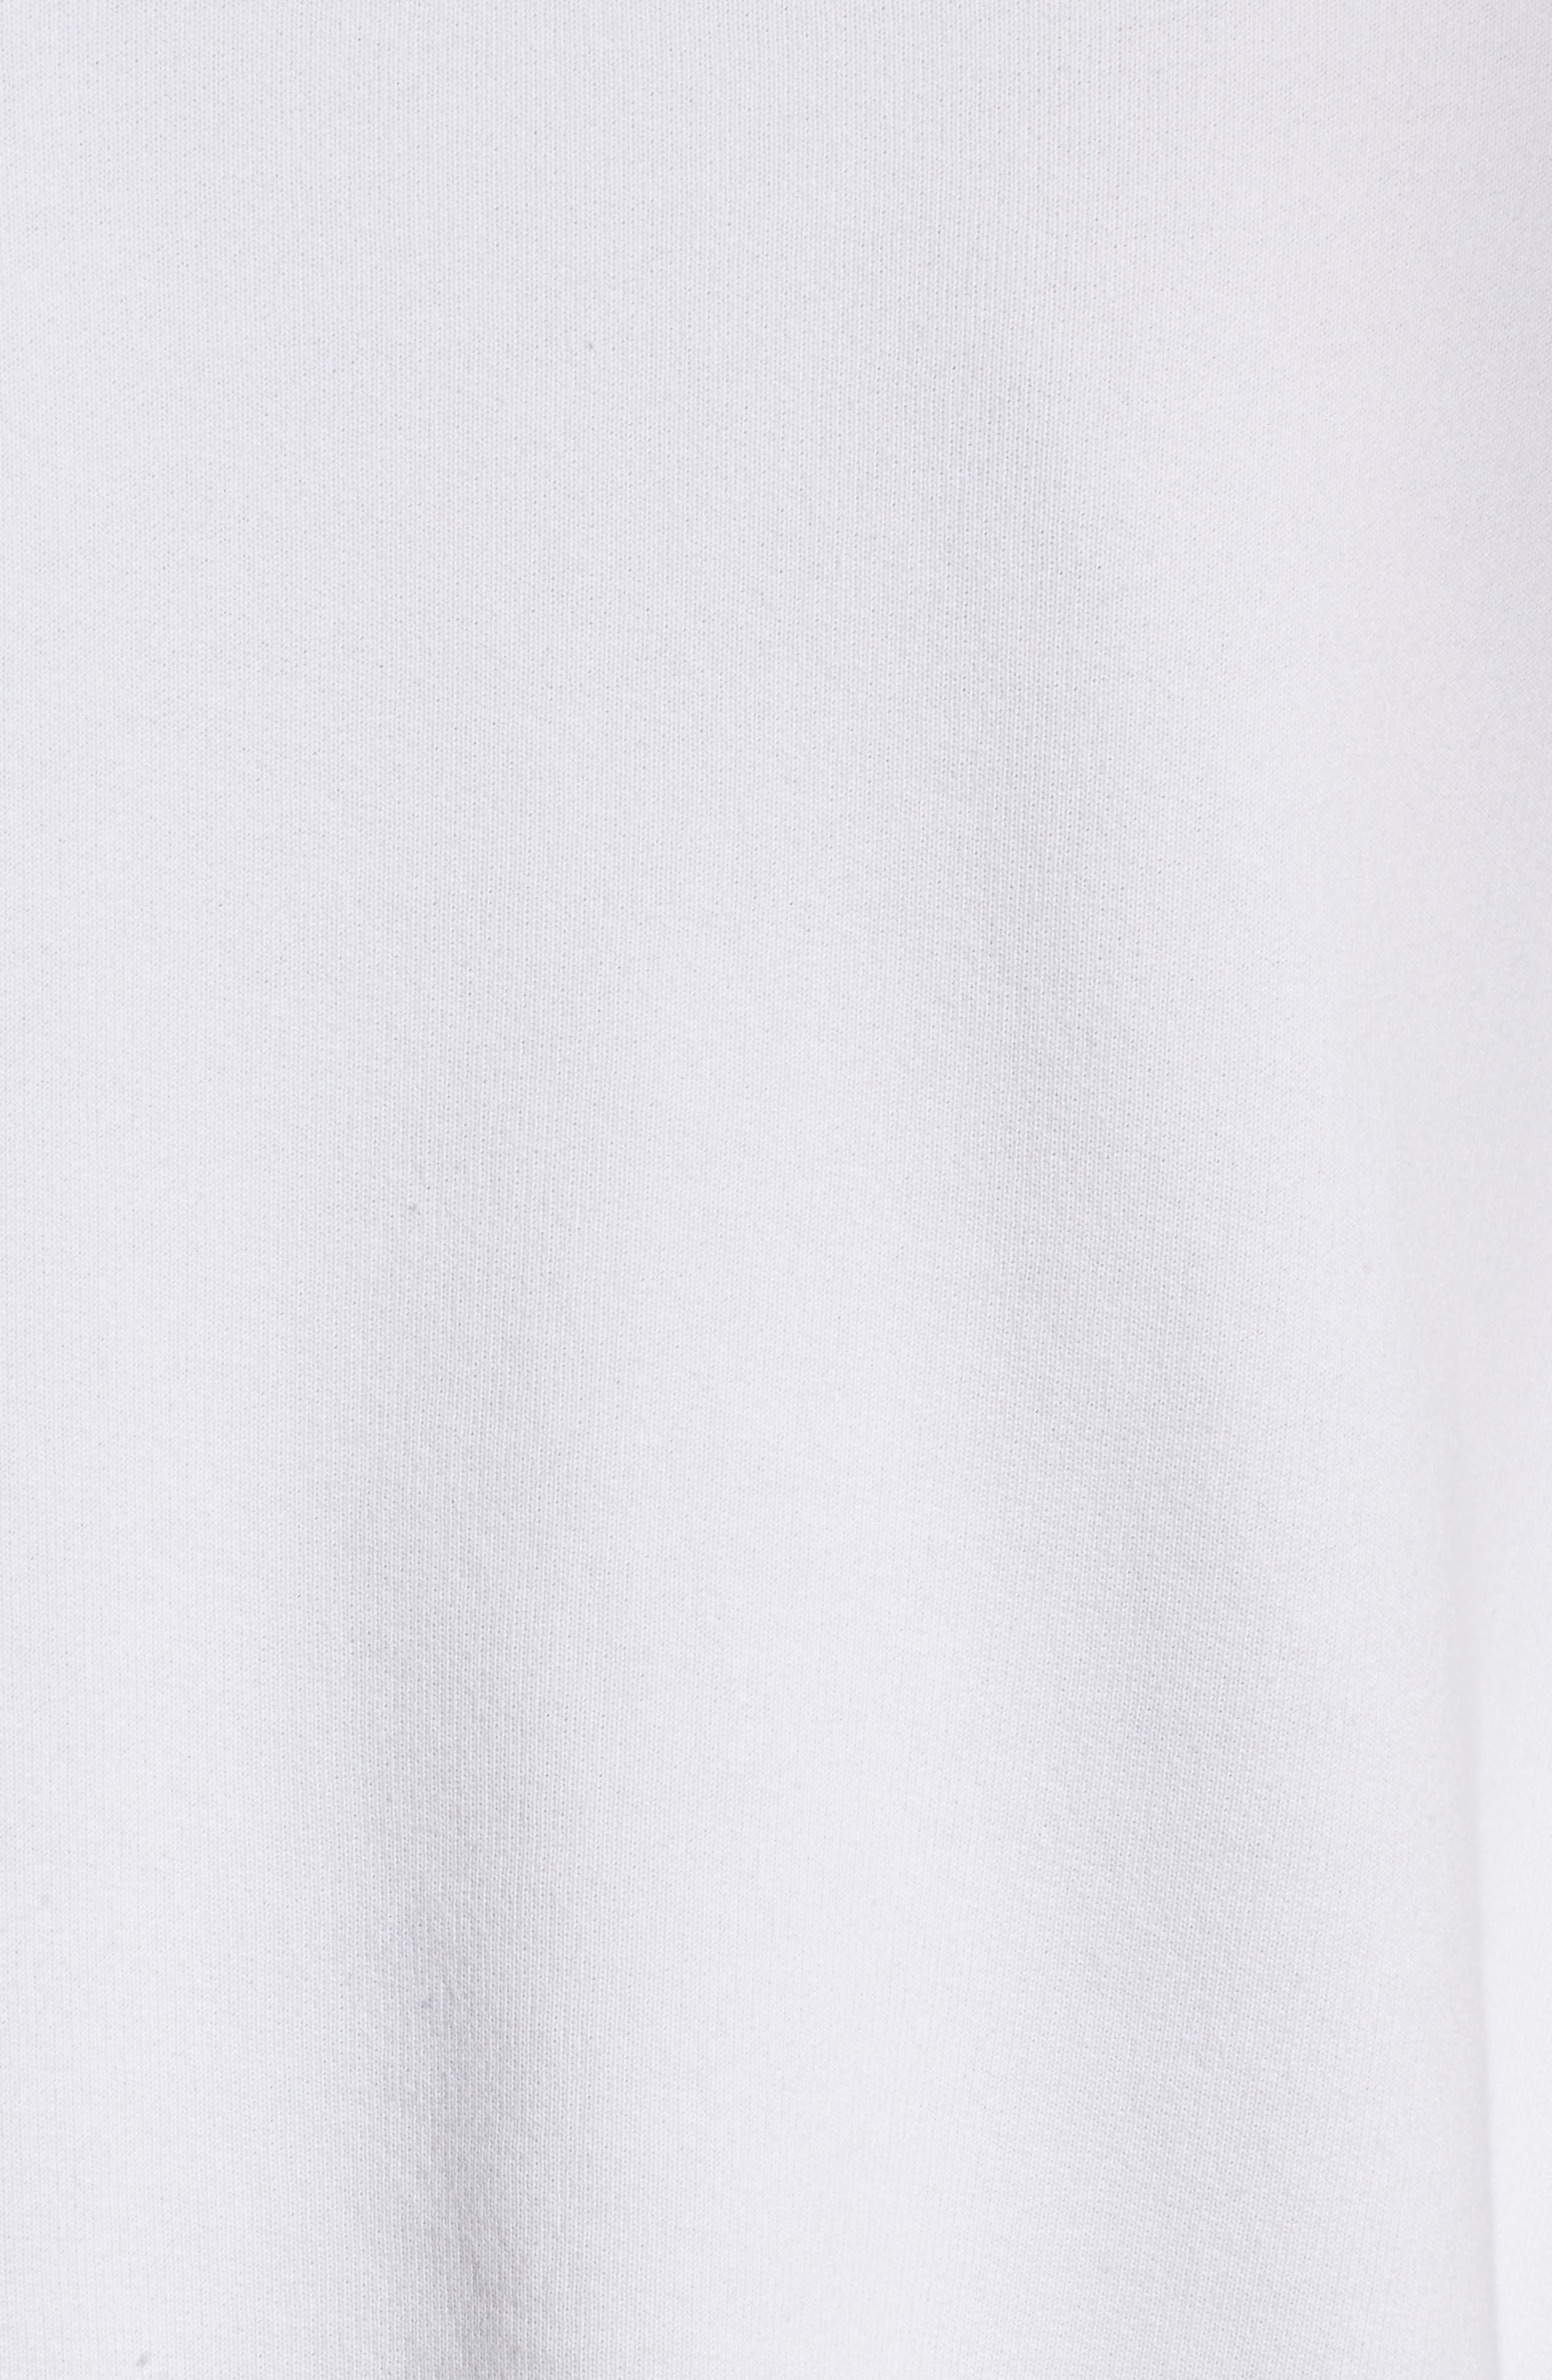 Zip Fleece Jacket,                             Alternate thumbnail 5, color,